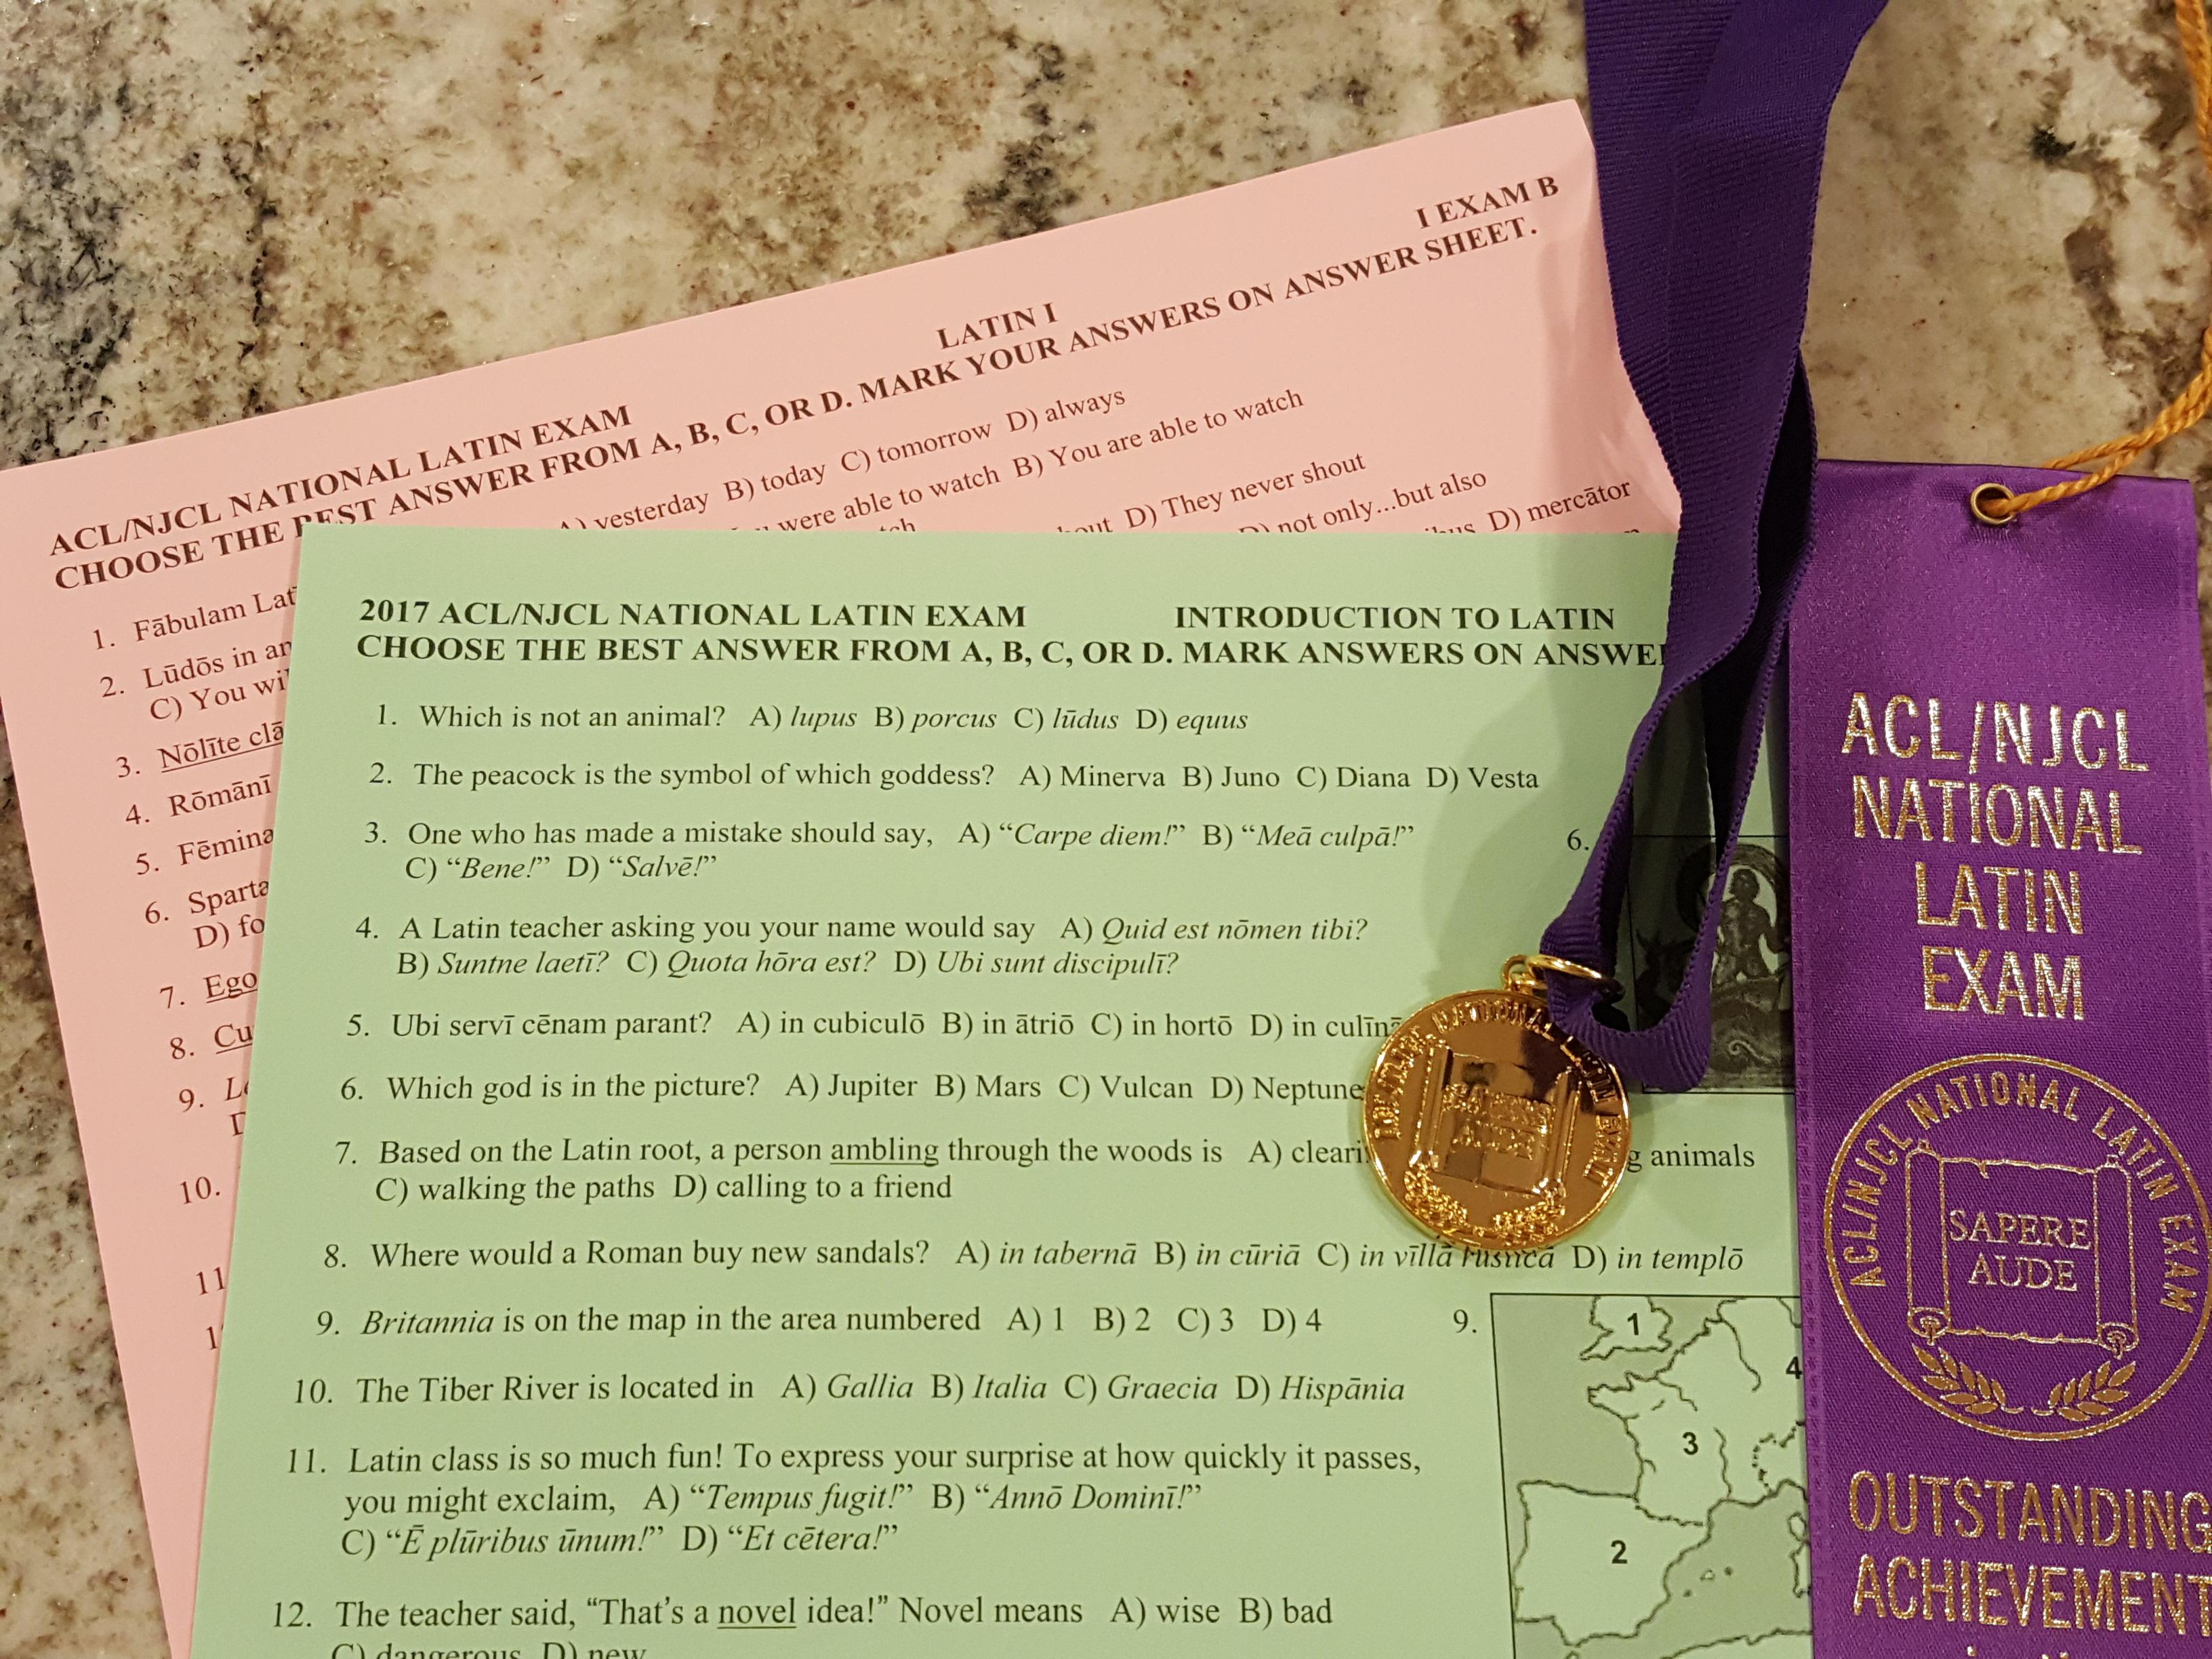 NLE Photos Exam and Awards